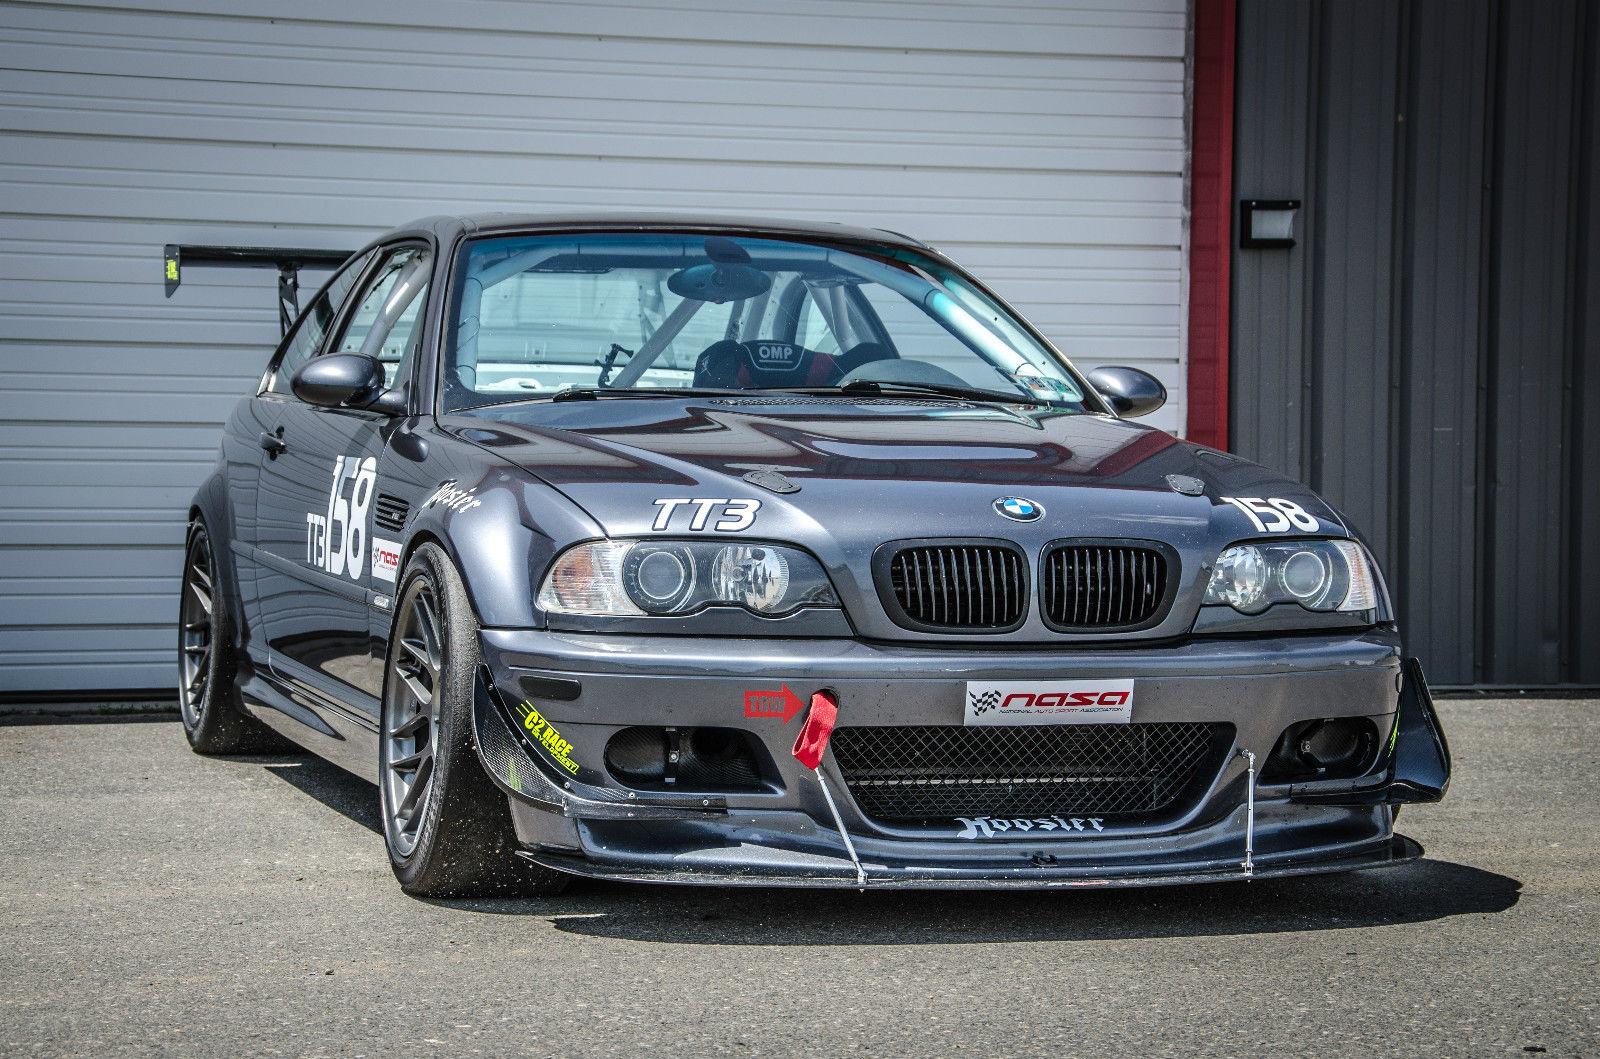 2002 BMW M3 Race Car for sale - thecherrycreeknews.com